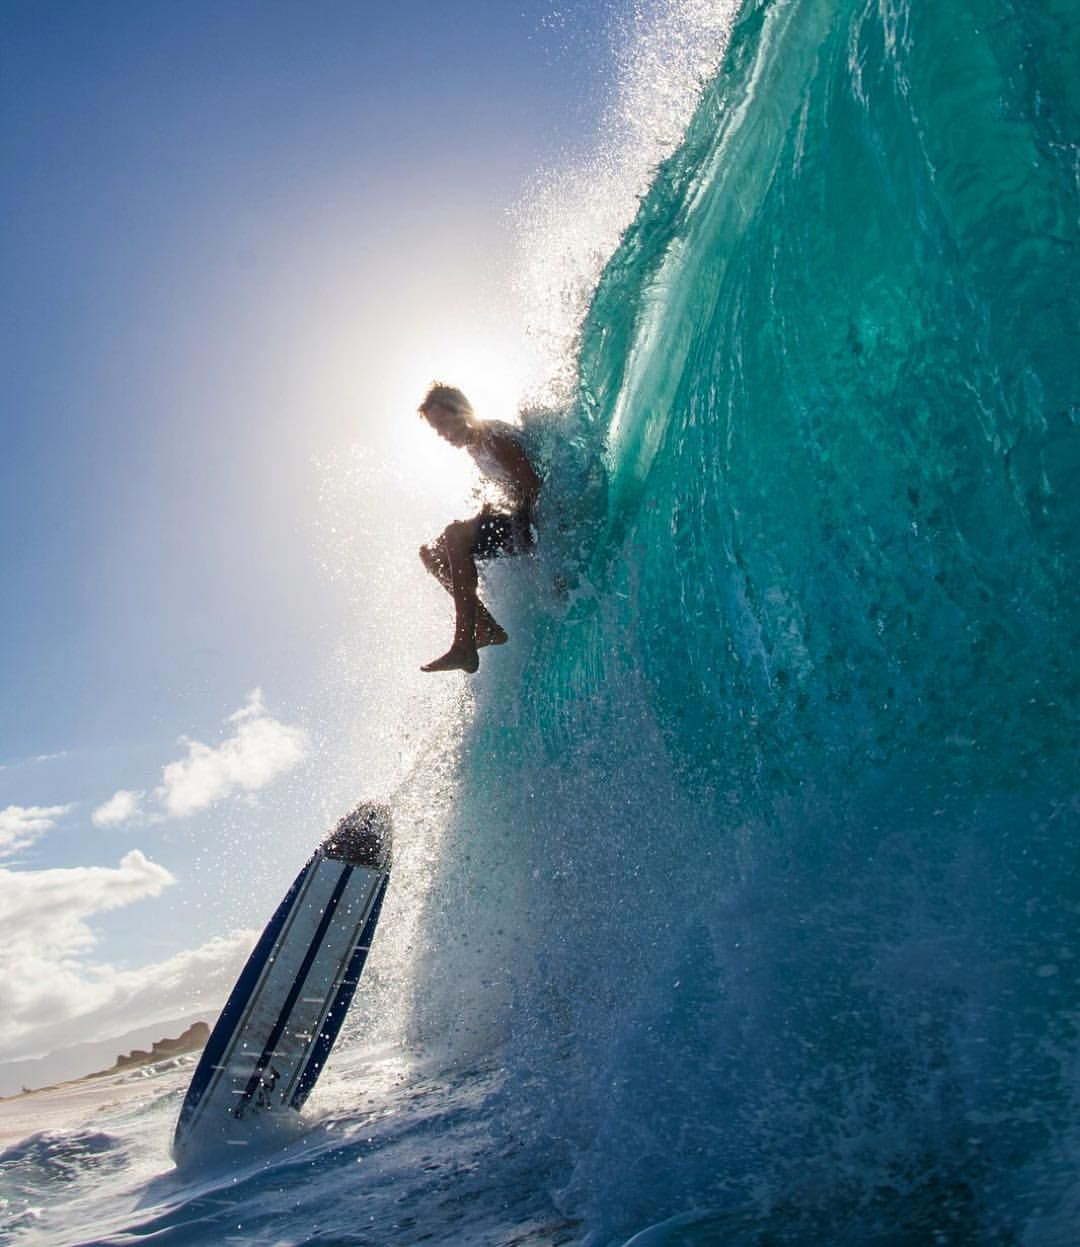 Girls Surfing Wallpaper: Just Chillin, No Biggie // Surfing, Wave, Barrell, Tube